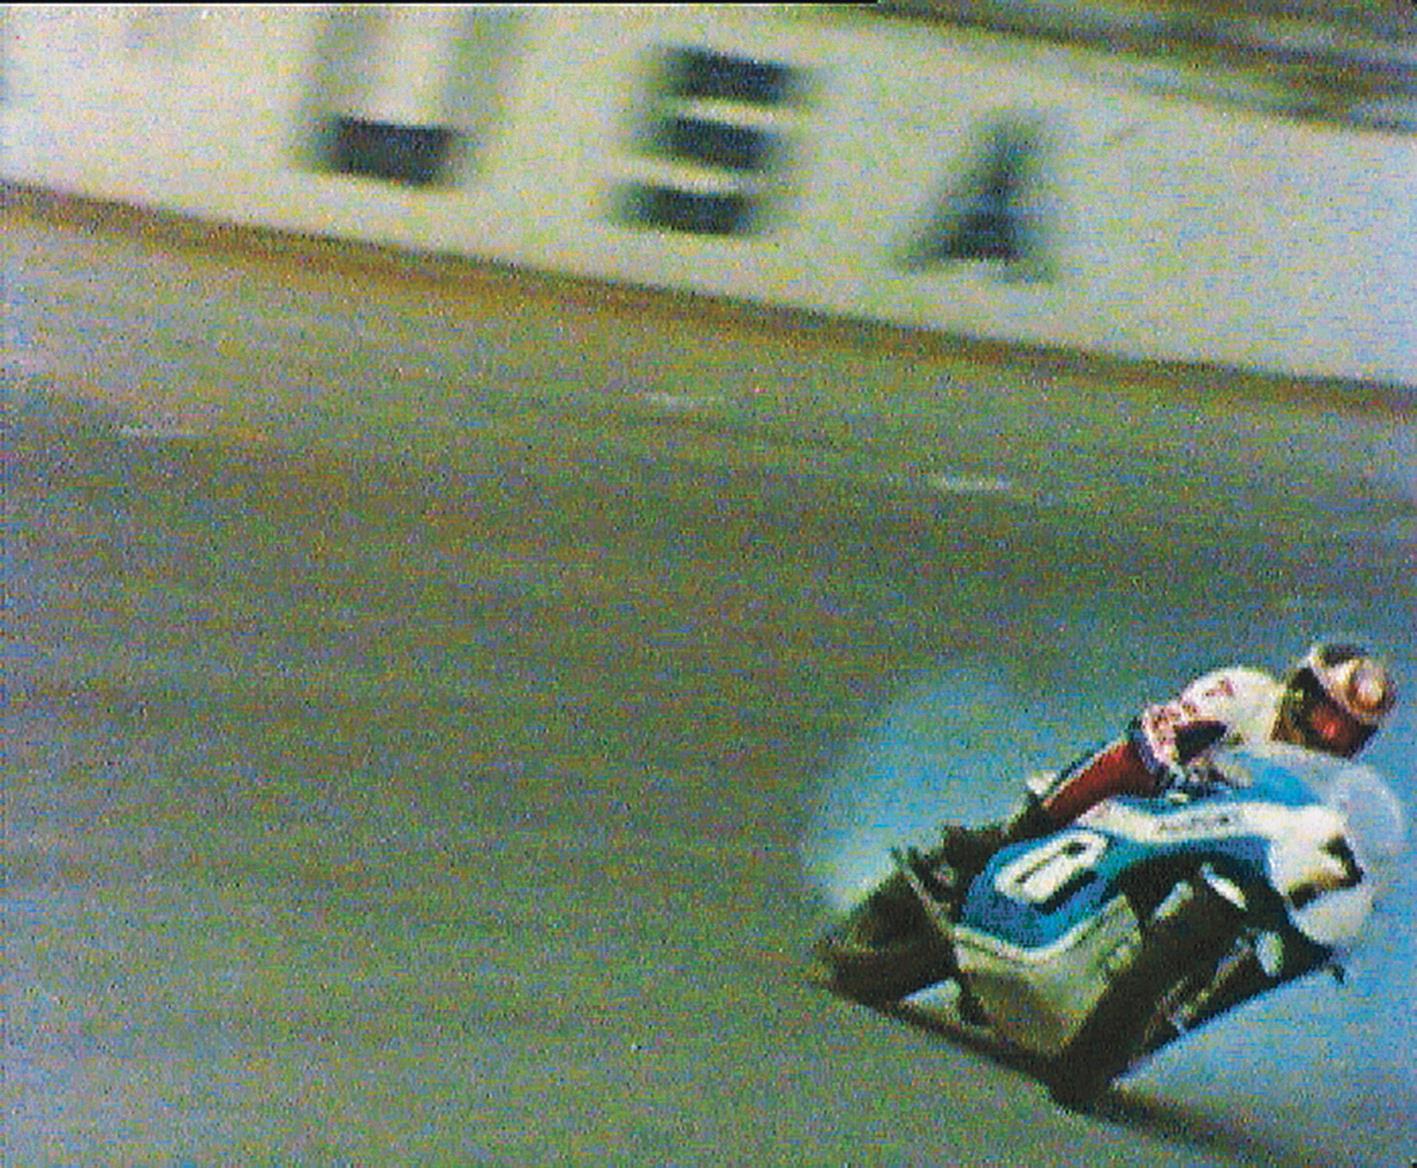 Sheene crash at Daytona